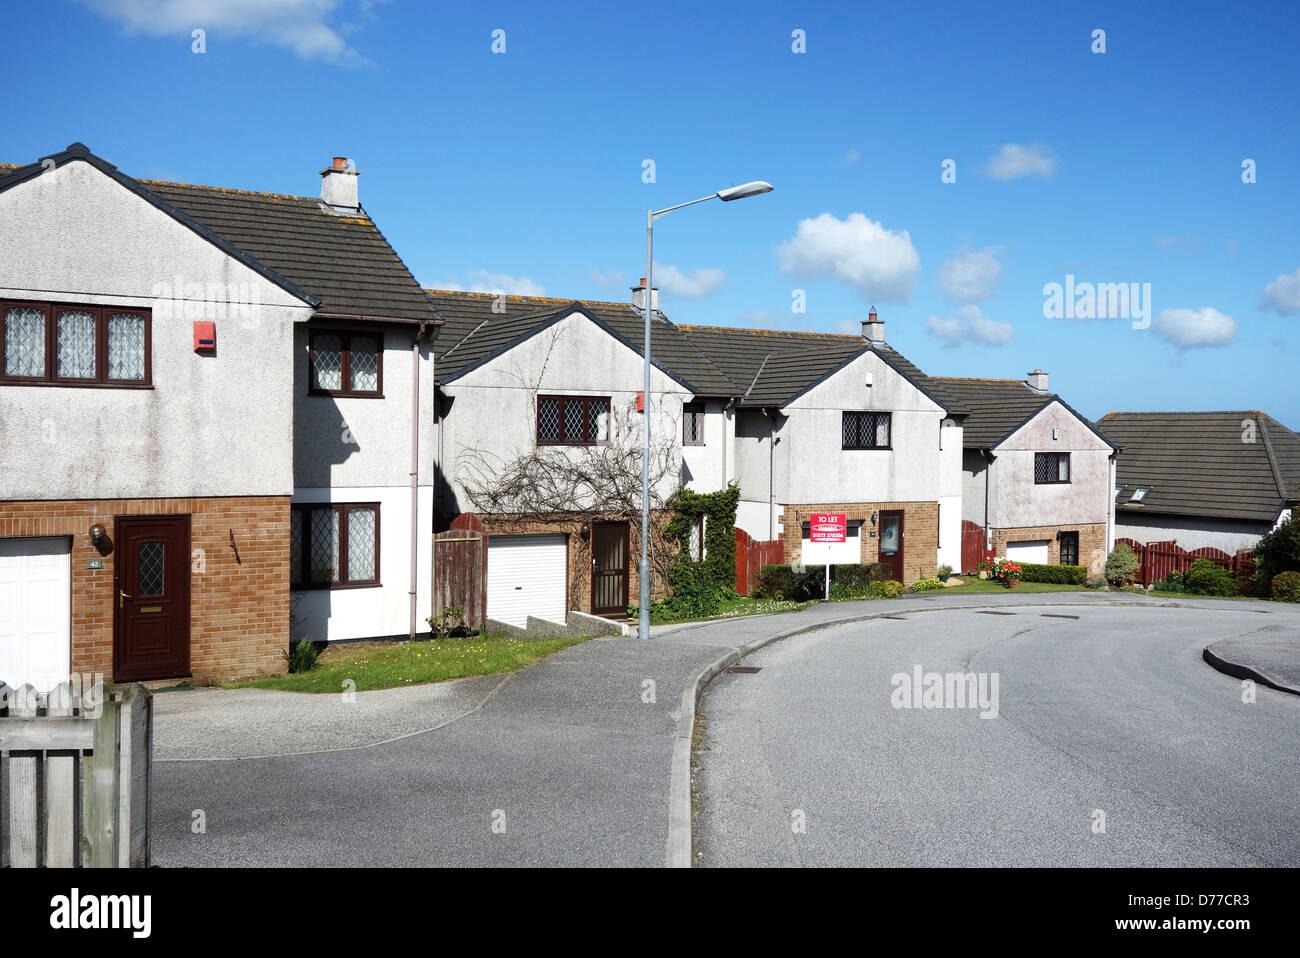 Detached houses suburban housing estate uk - Stock Image